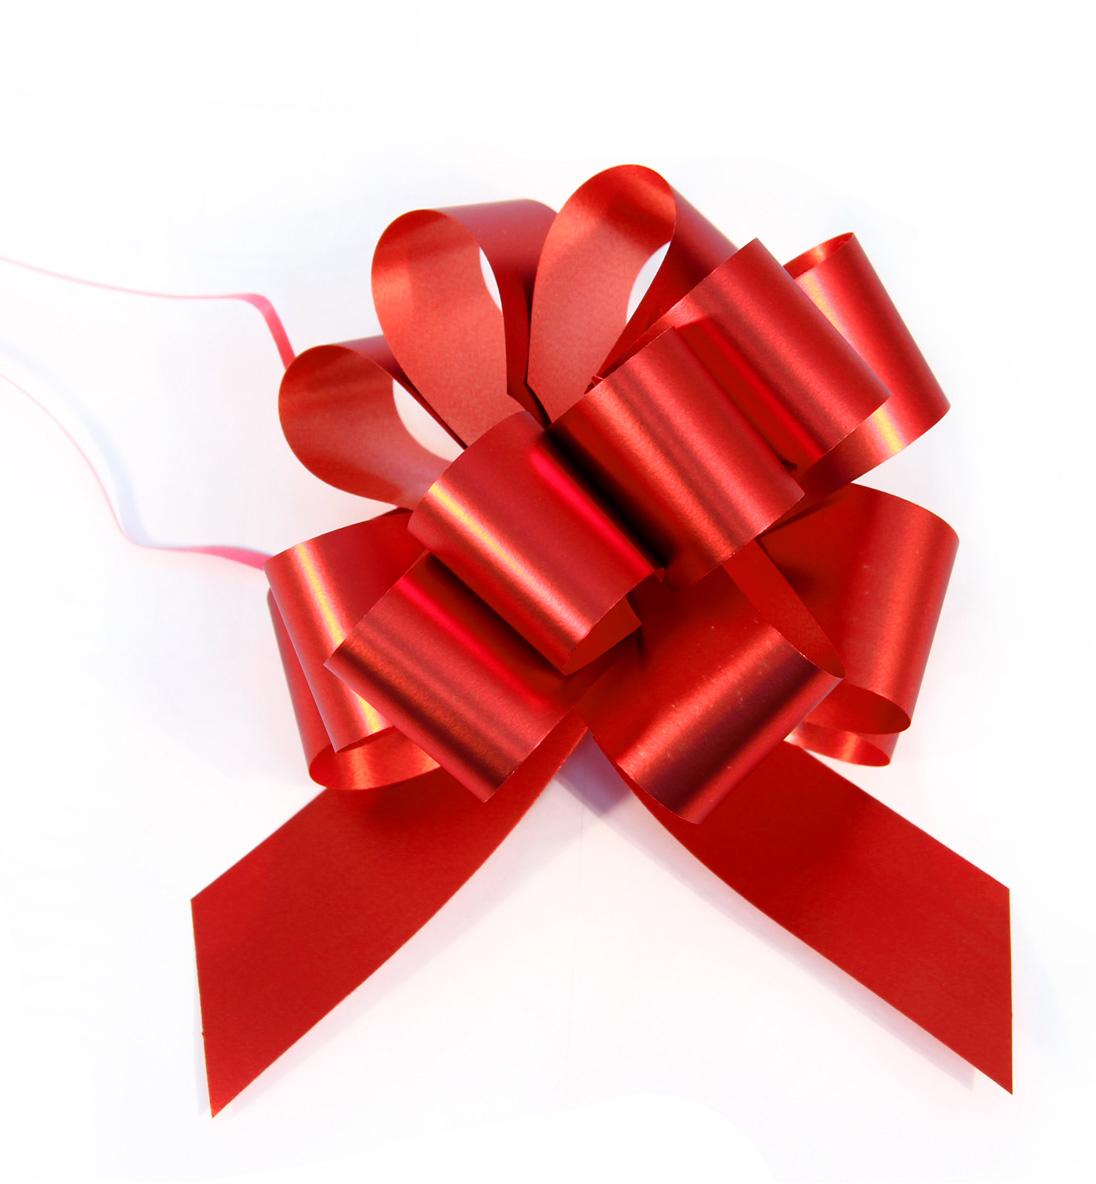 Бант упаковочный Veld-Co Шар, цвет: красный, 3 х 100 см, 10 шт. 44910 набор декоративных лент veld co 1 9 см х 3 м 30 шт